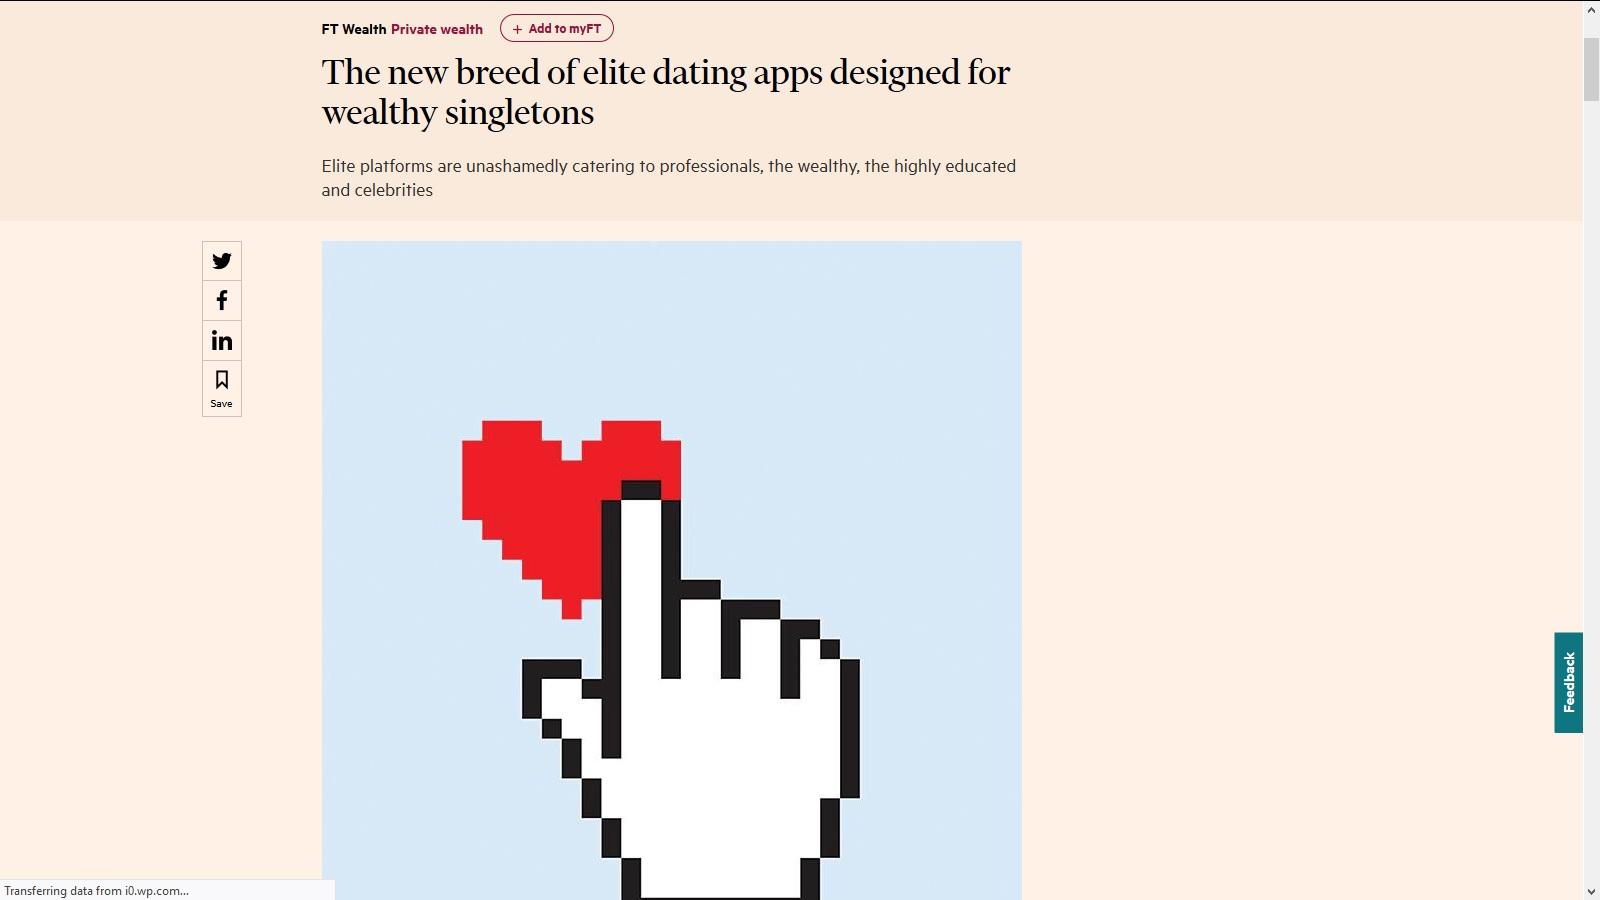 think, Partnersuche online erfolgreich all? Rather useful